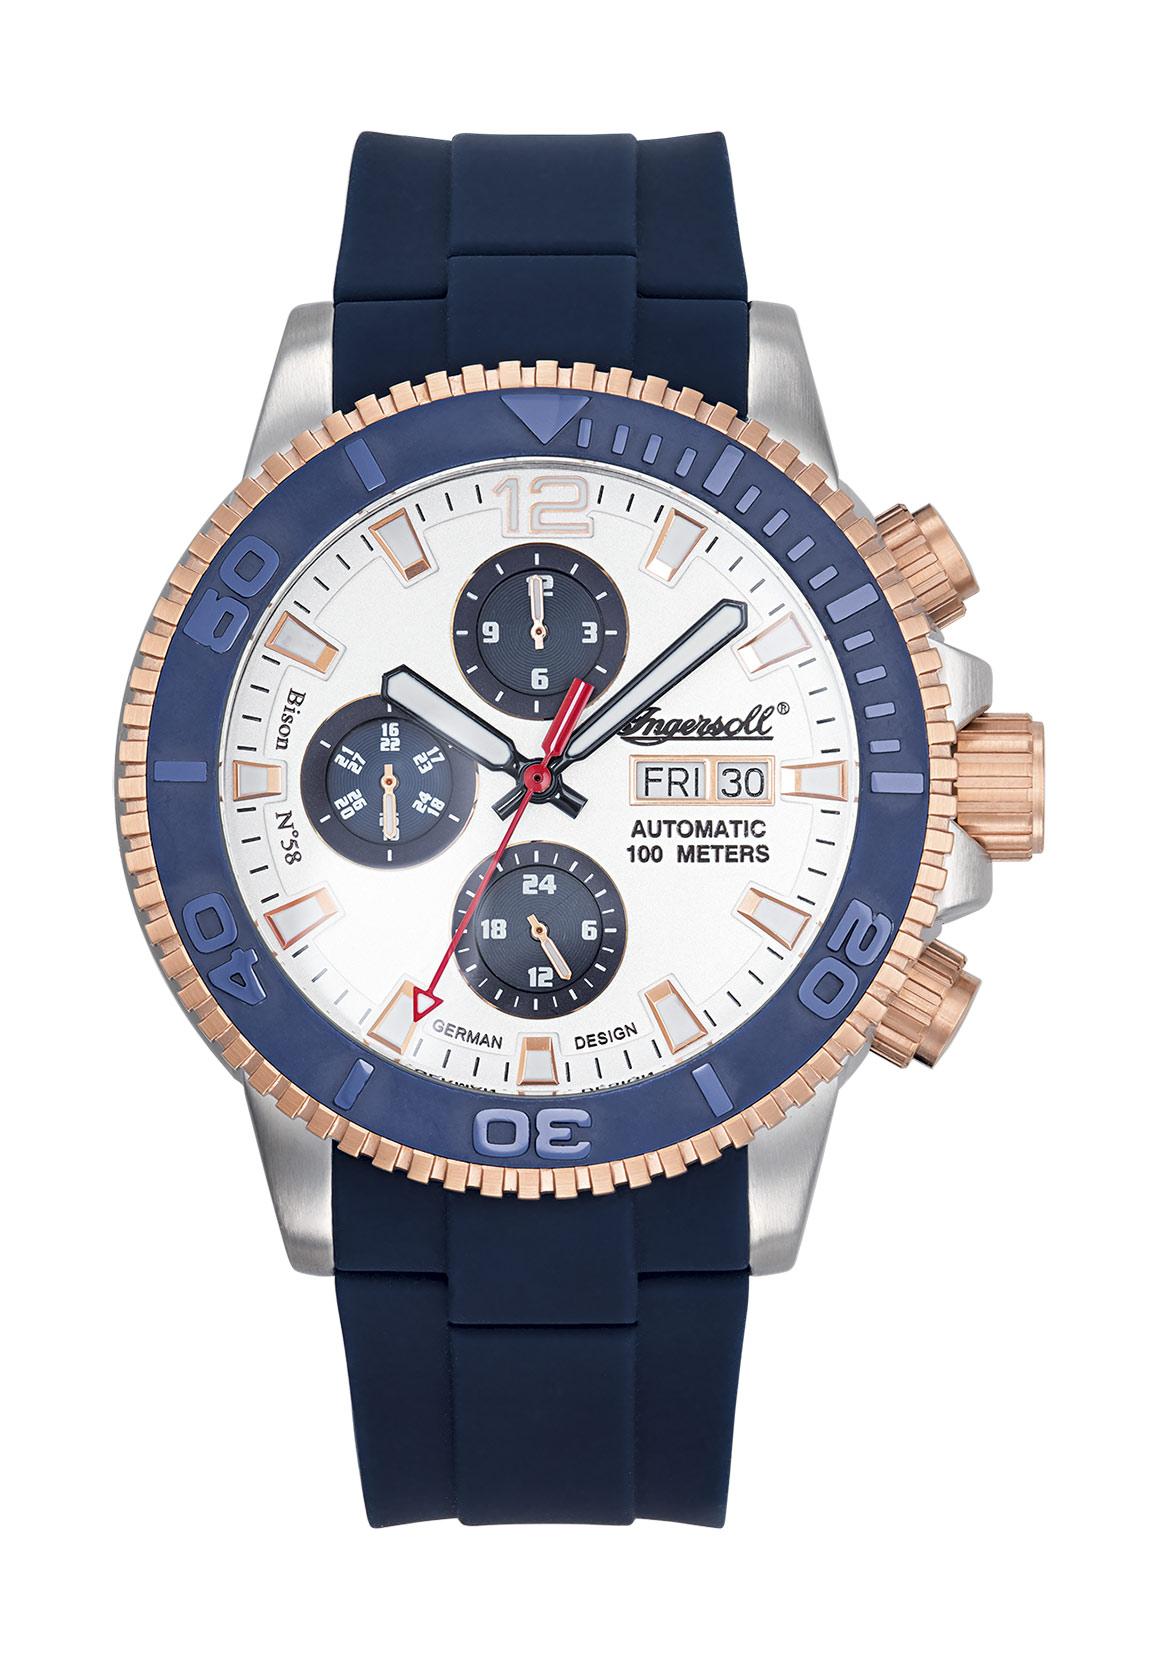 Ingersoll Armbanduhr BISON NO.58 IN1105BL